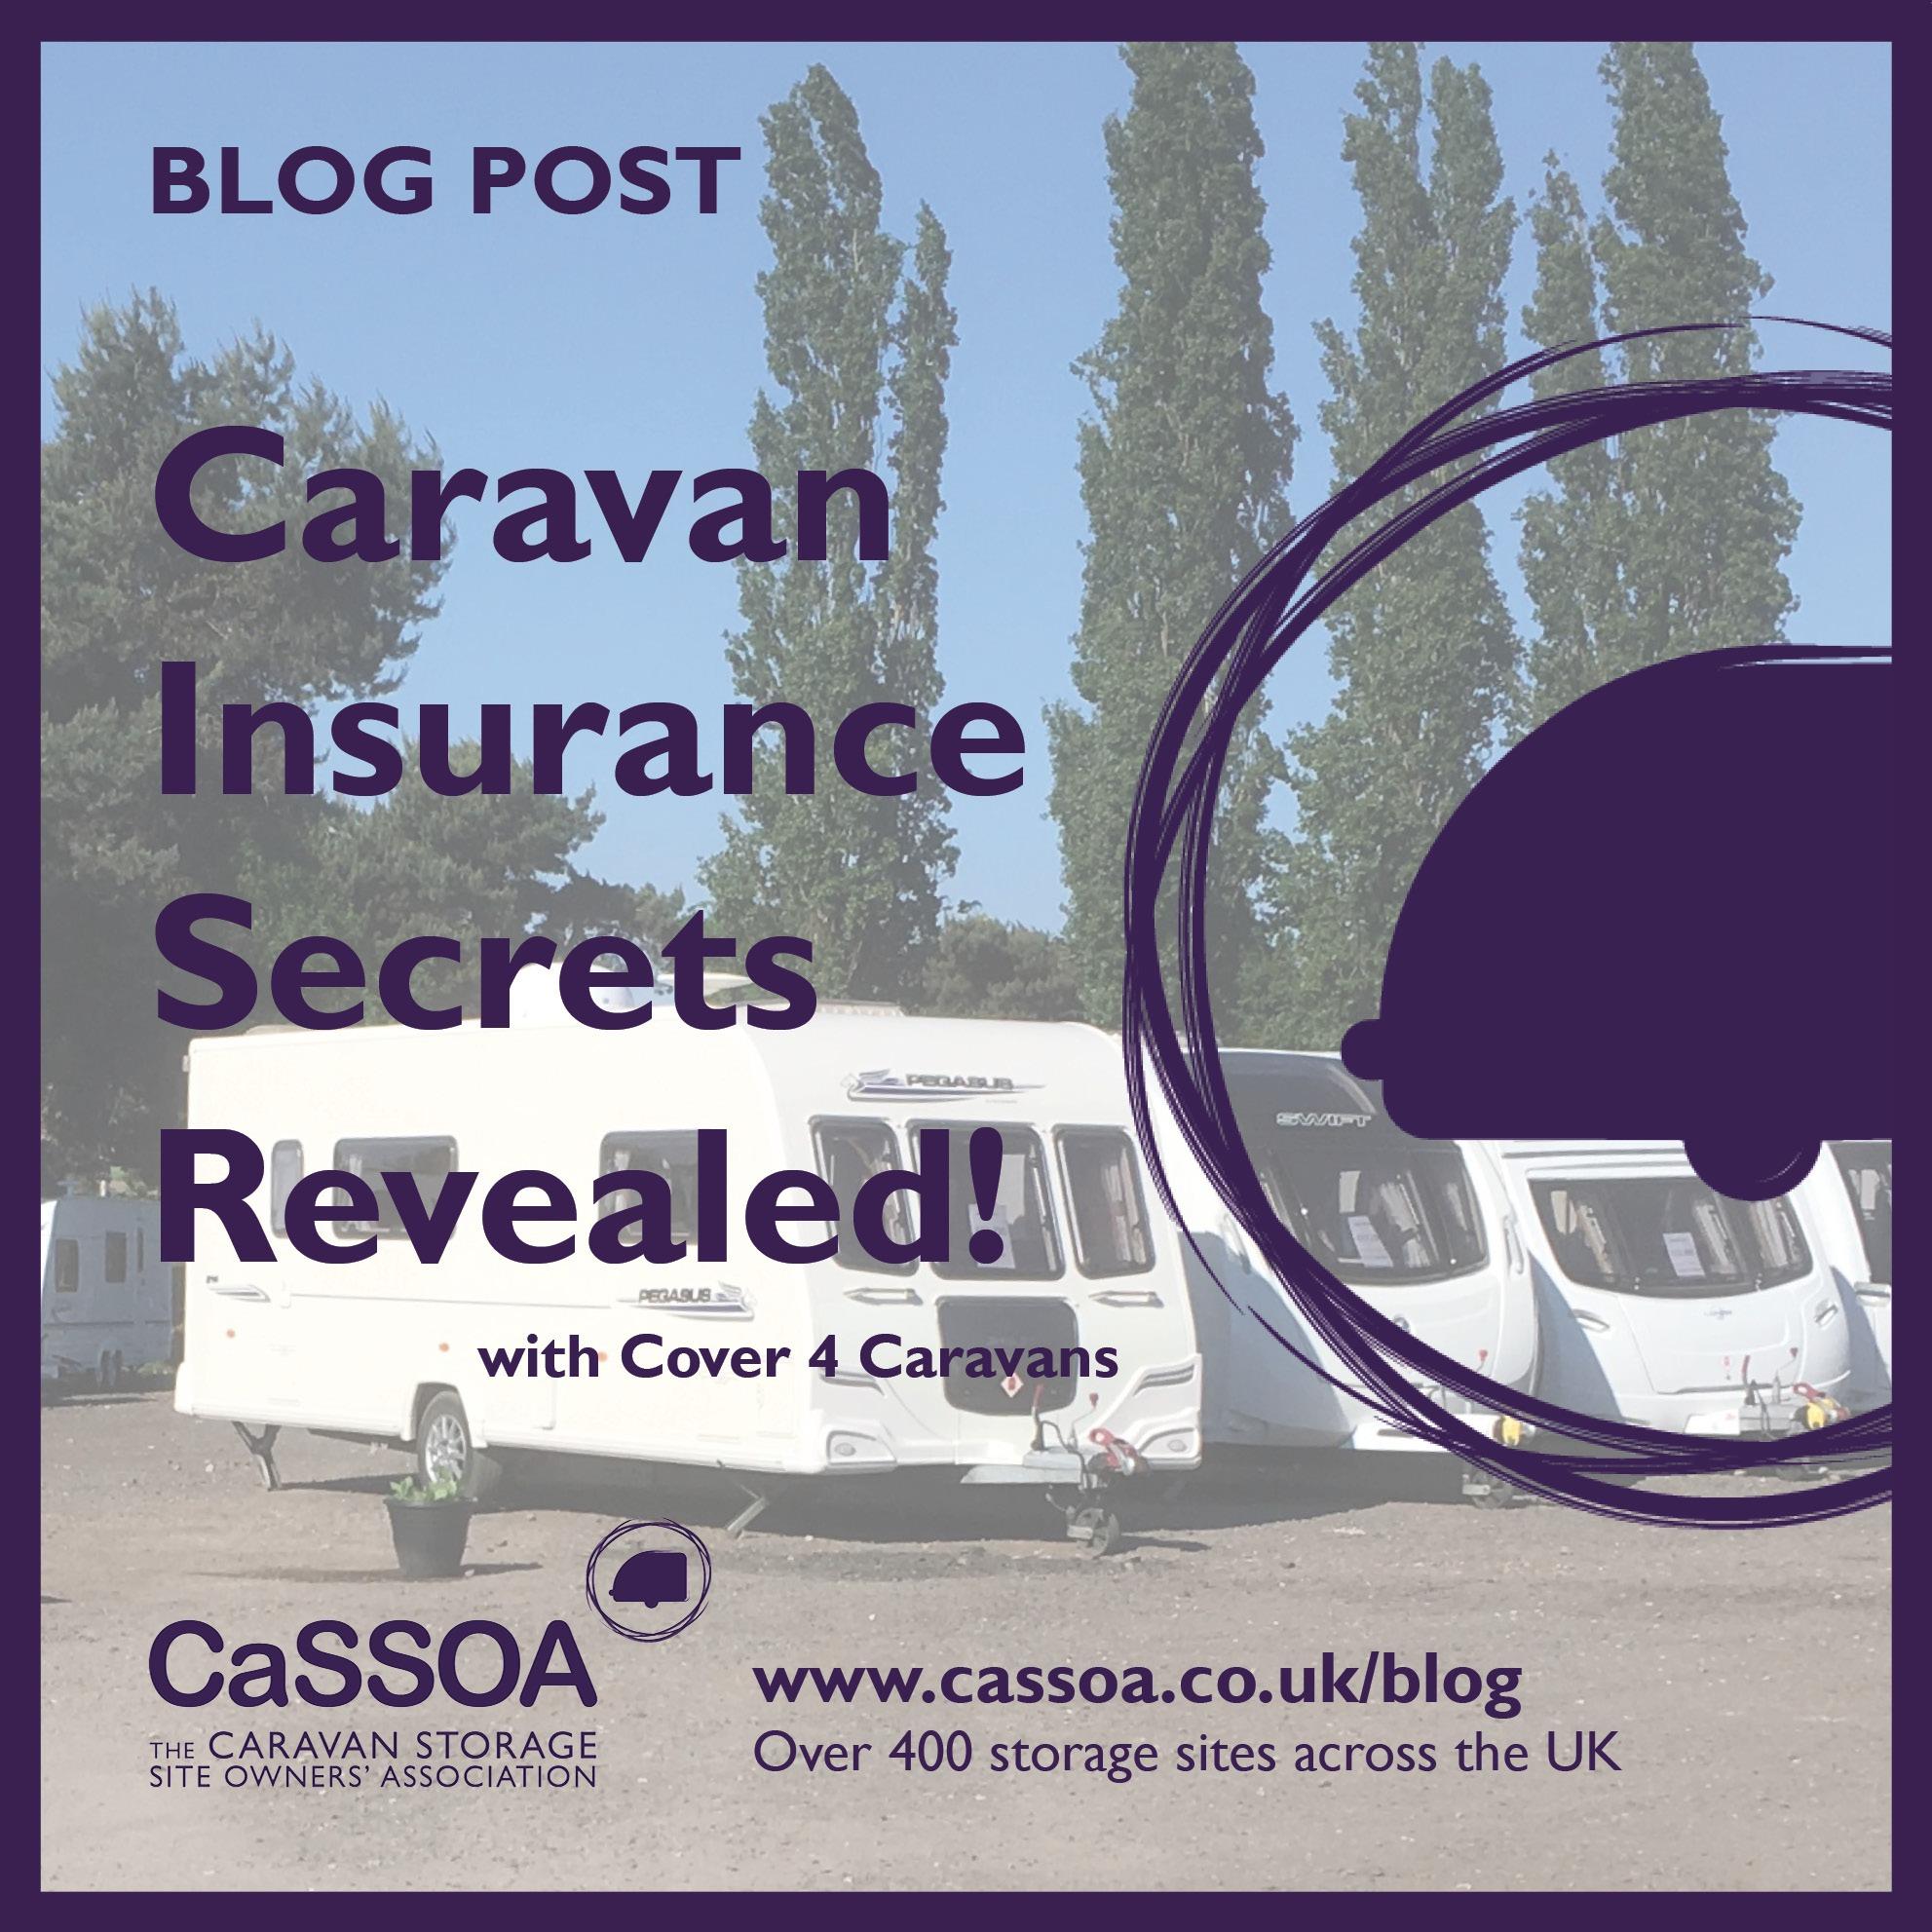 Caravan Insurance Secrets